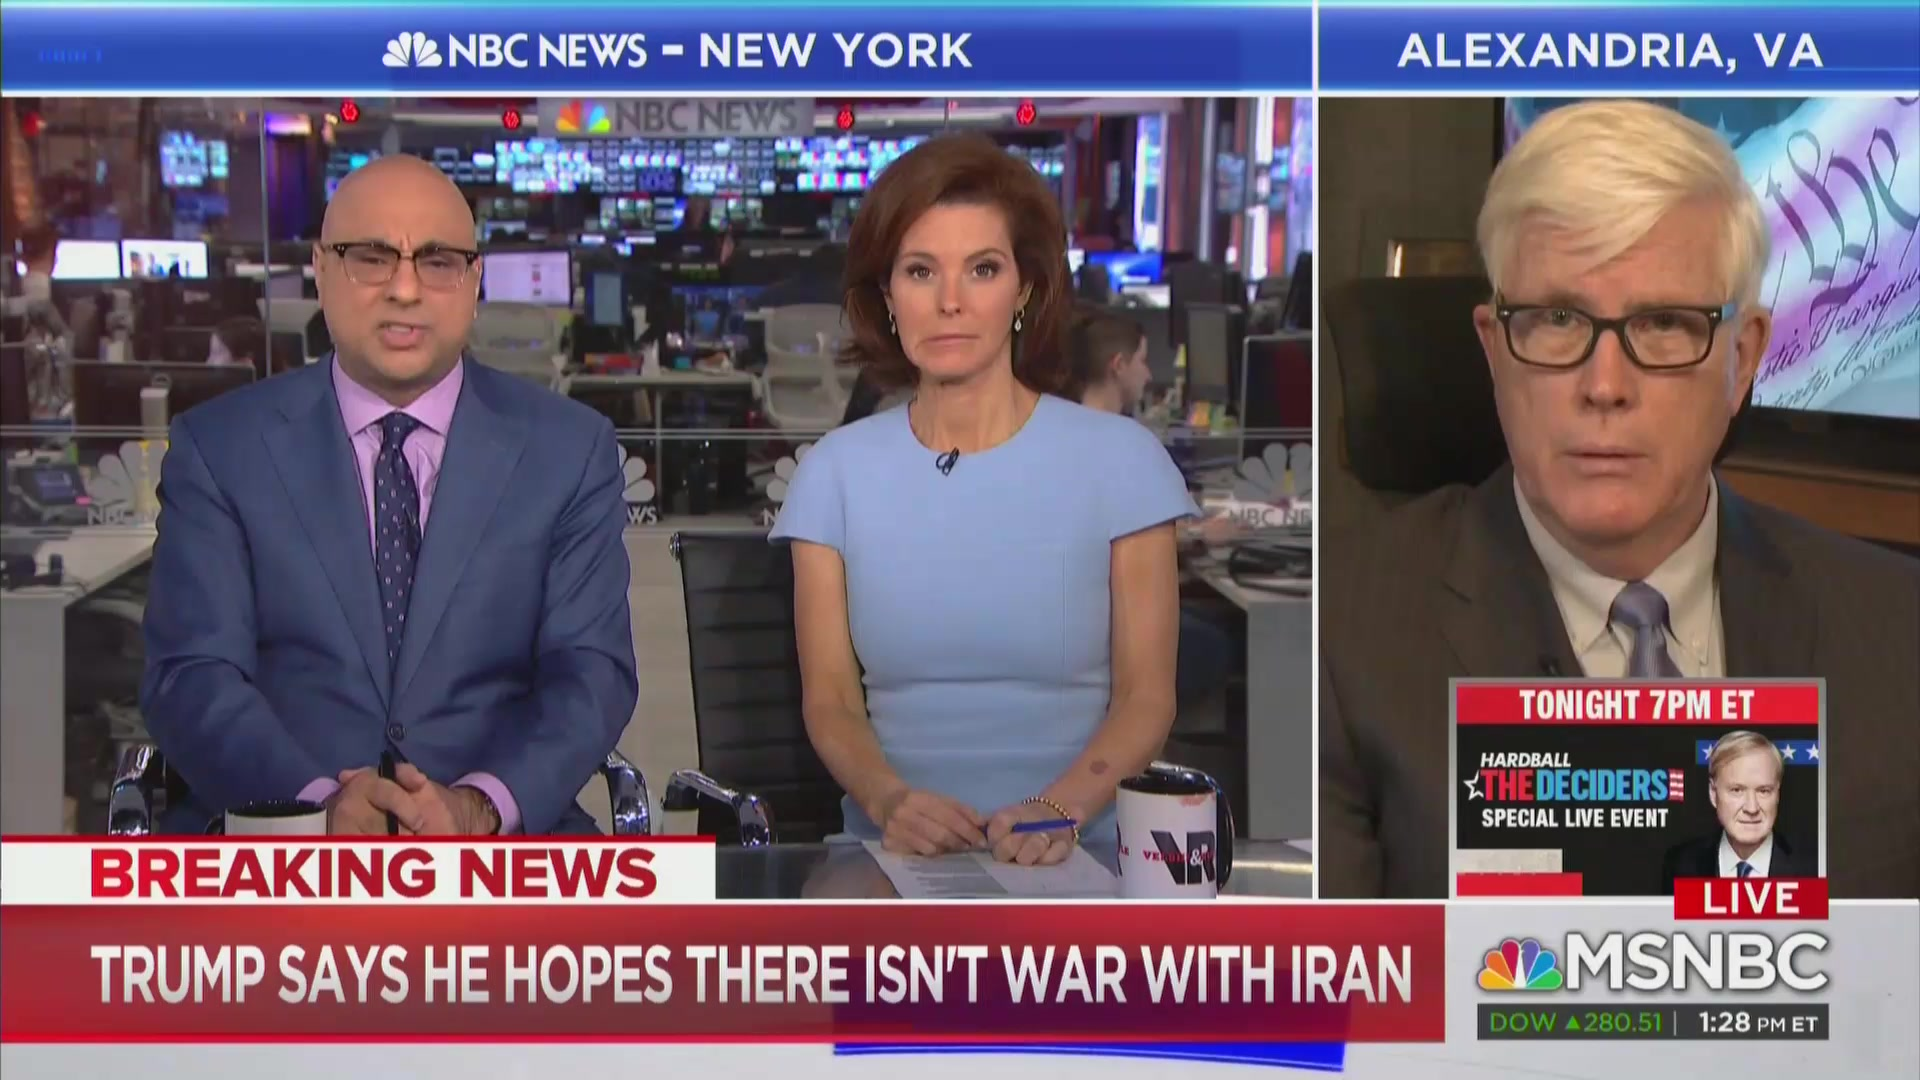 MSNBC's Ali Velshi Blows Up at Hugh Hewitt Over Iran: 'Just Stop for Heaven's Sake!'